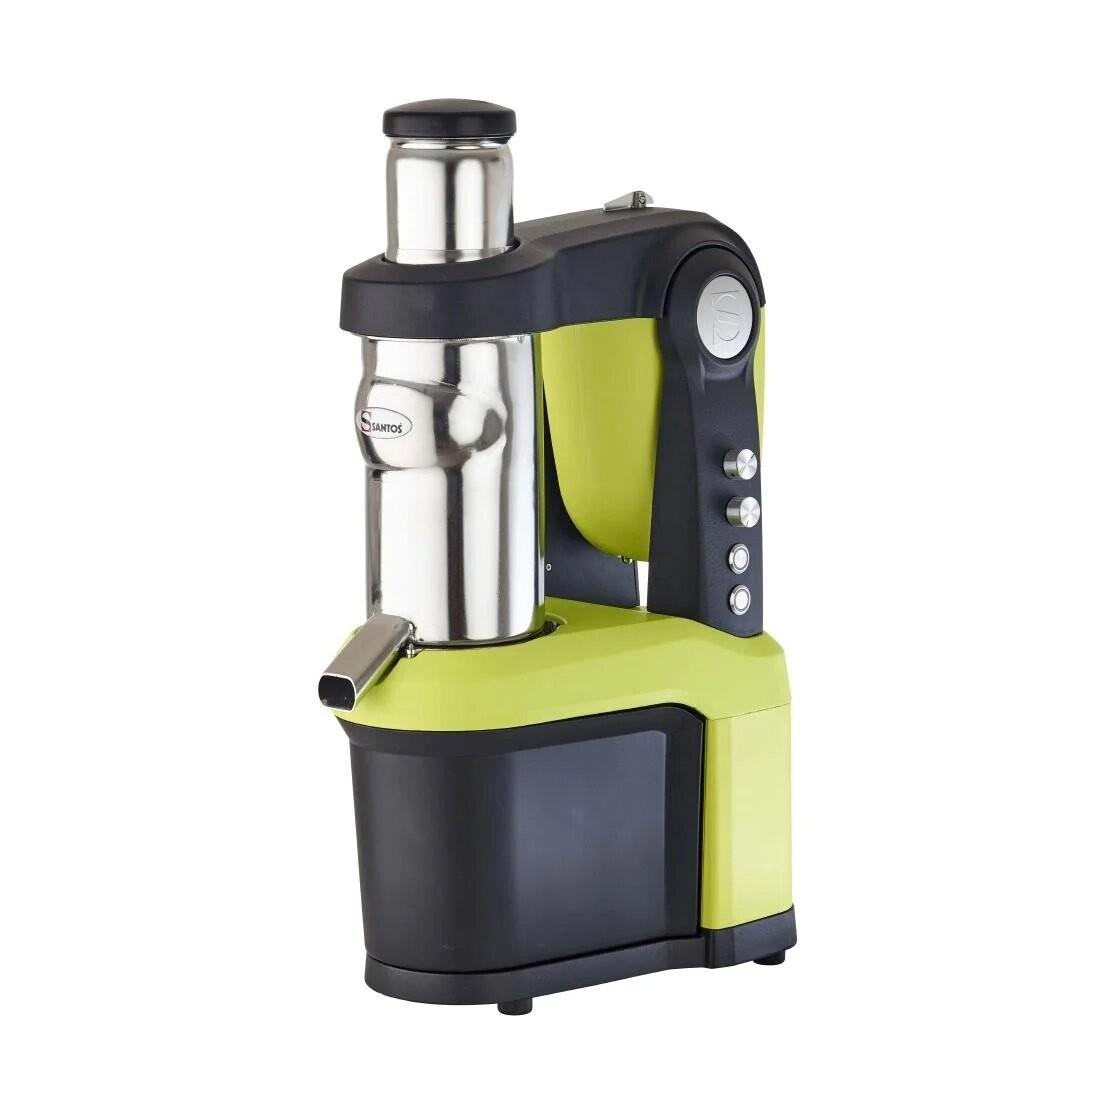 Santos CN990 Cold Press Juicer